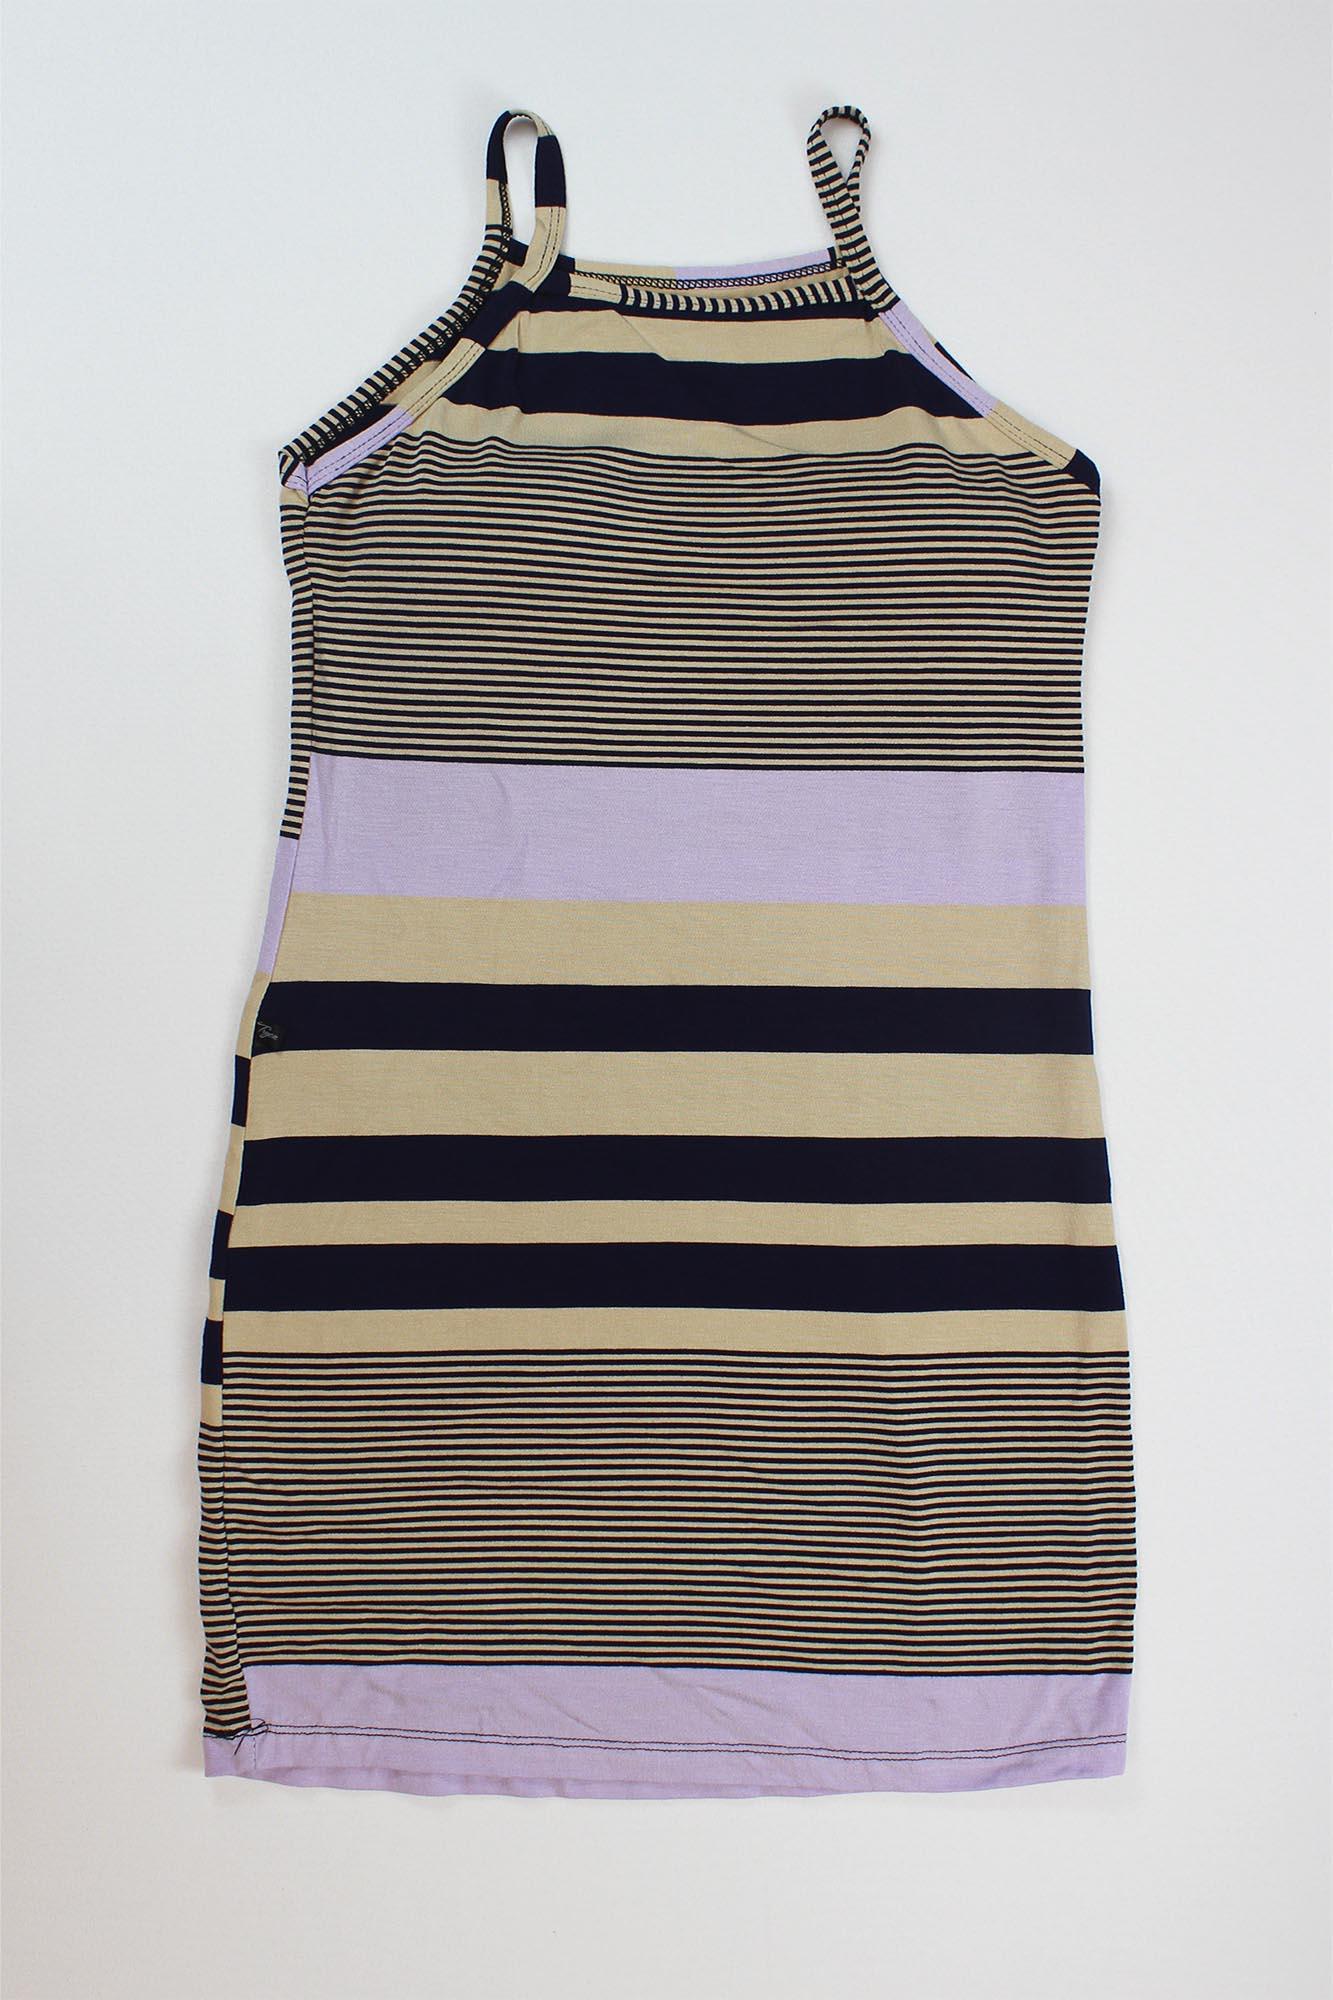 Vestido Curto Listrado com Bojo Feminino - Preto, Bege e Lilás